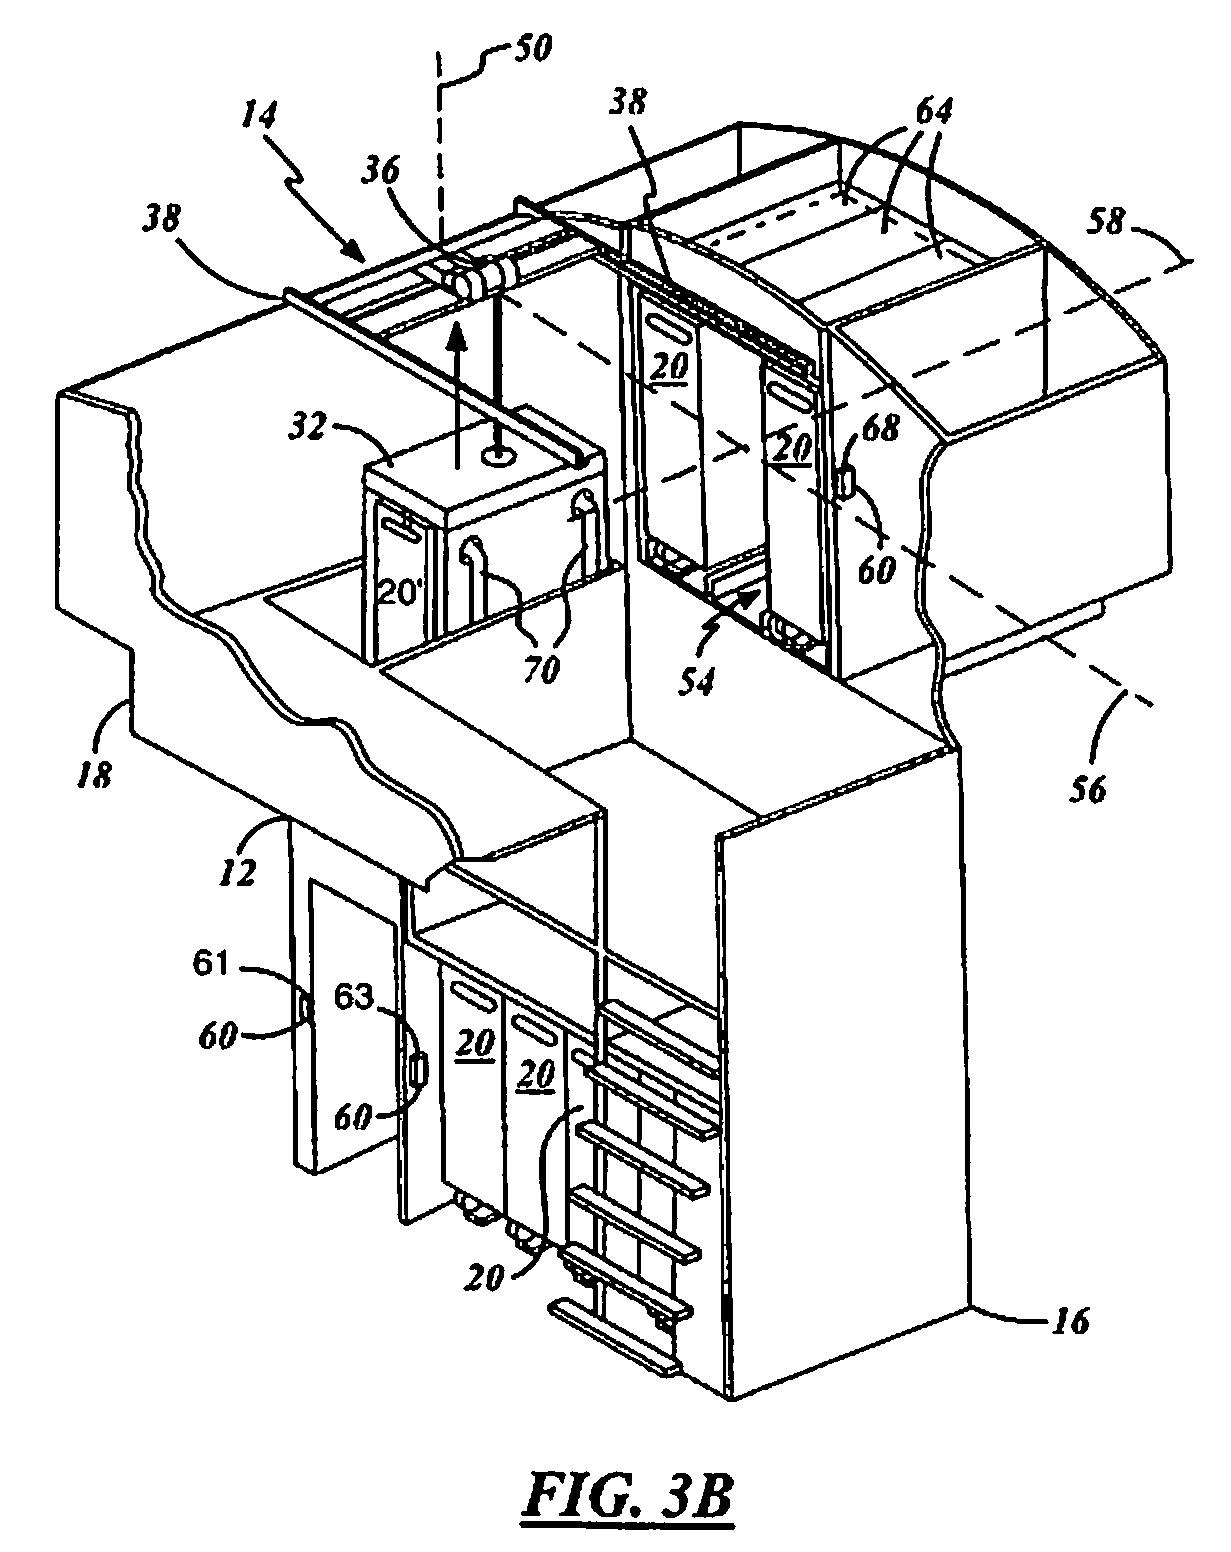 [Download 36+] Overhead Crane Control Wiring Diagram